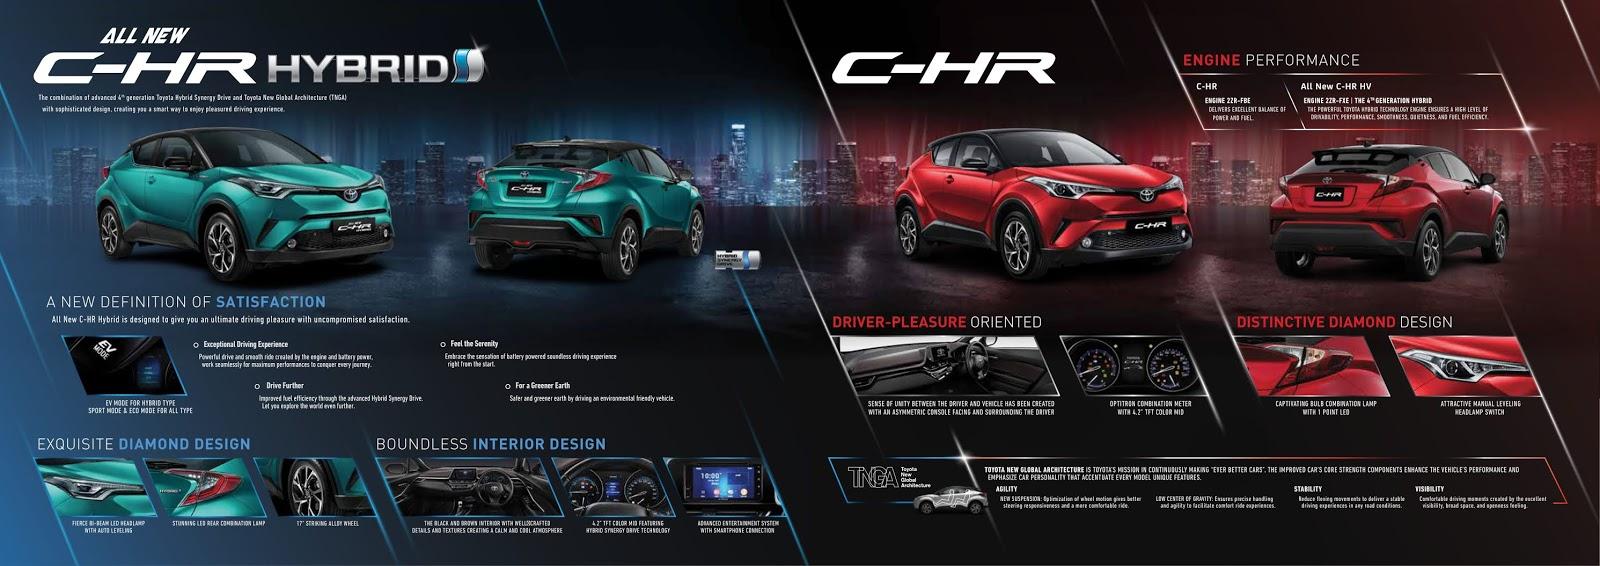 All New C-HR - Info Promo & Harga Toyota C-HR Bali 2020